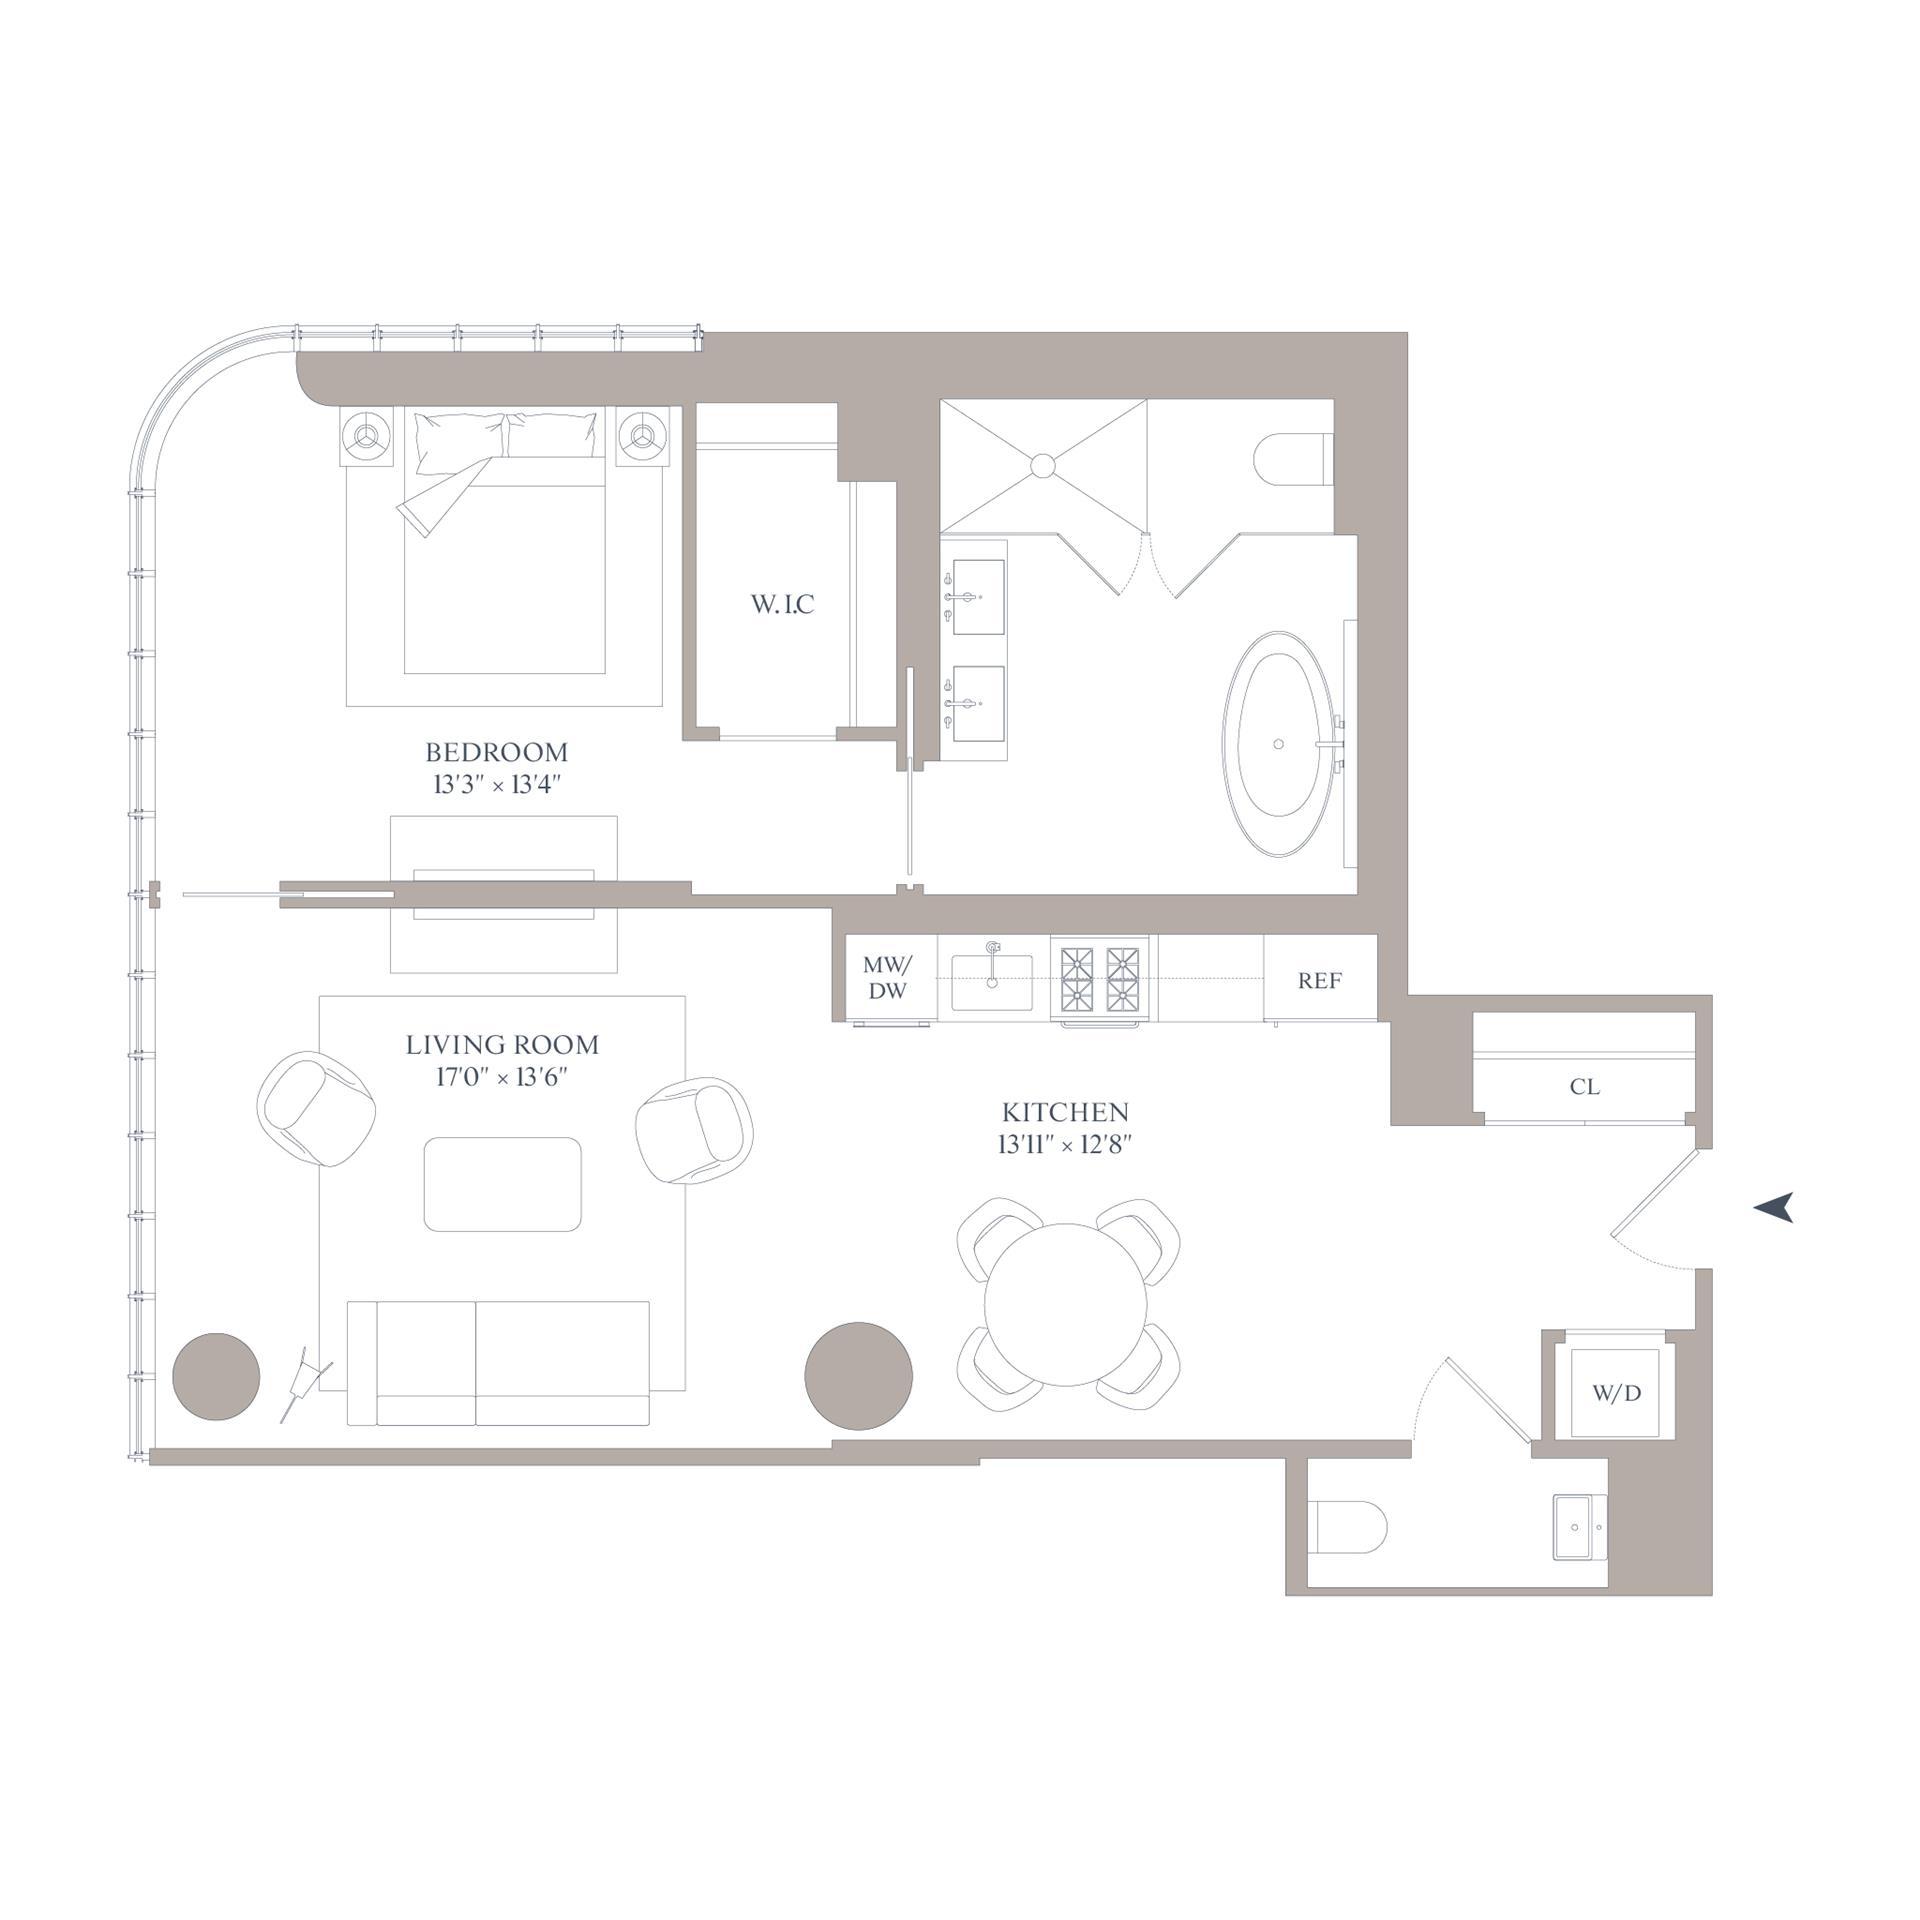 Floor plan of 565 Broome St, S7A - SoHo - Nolita, New York